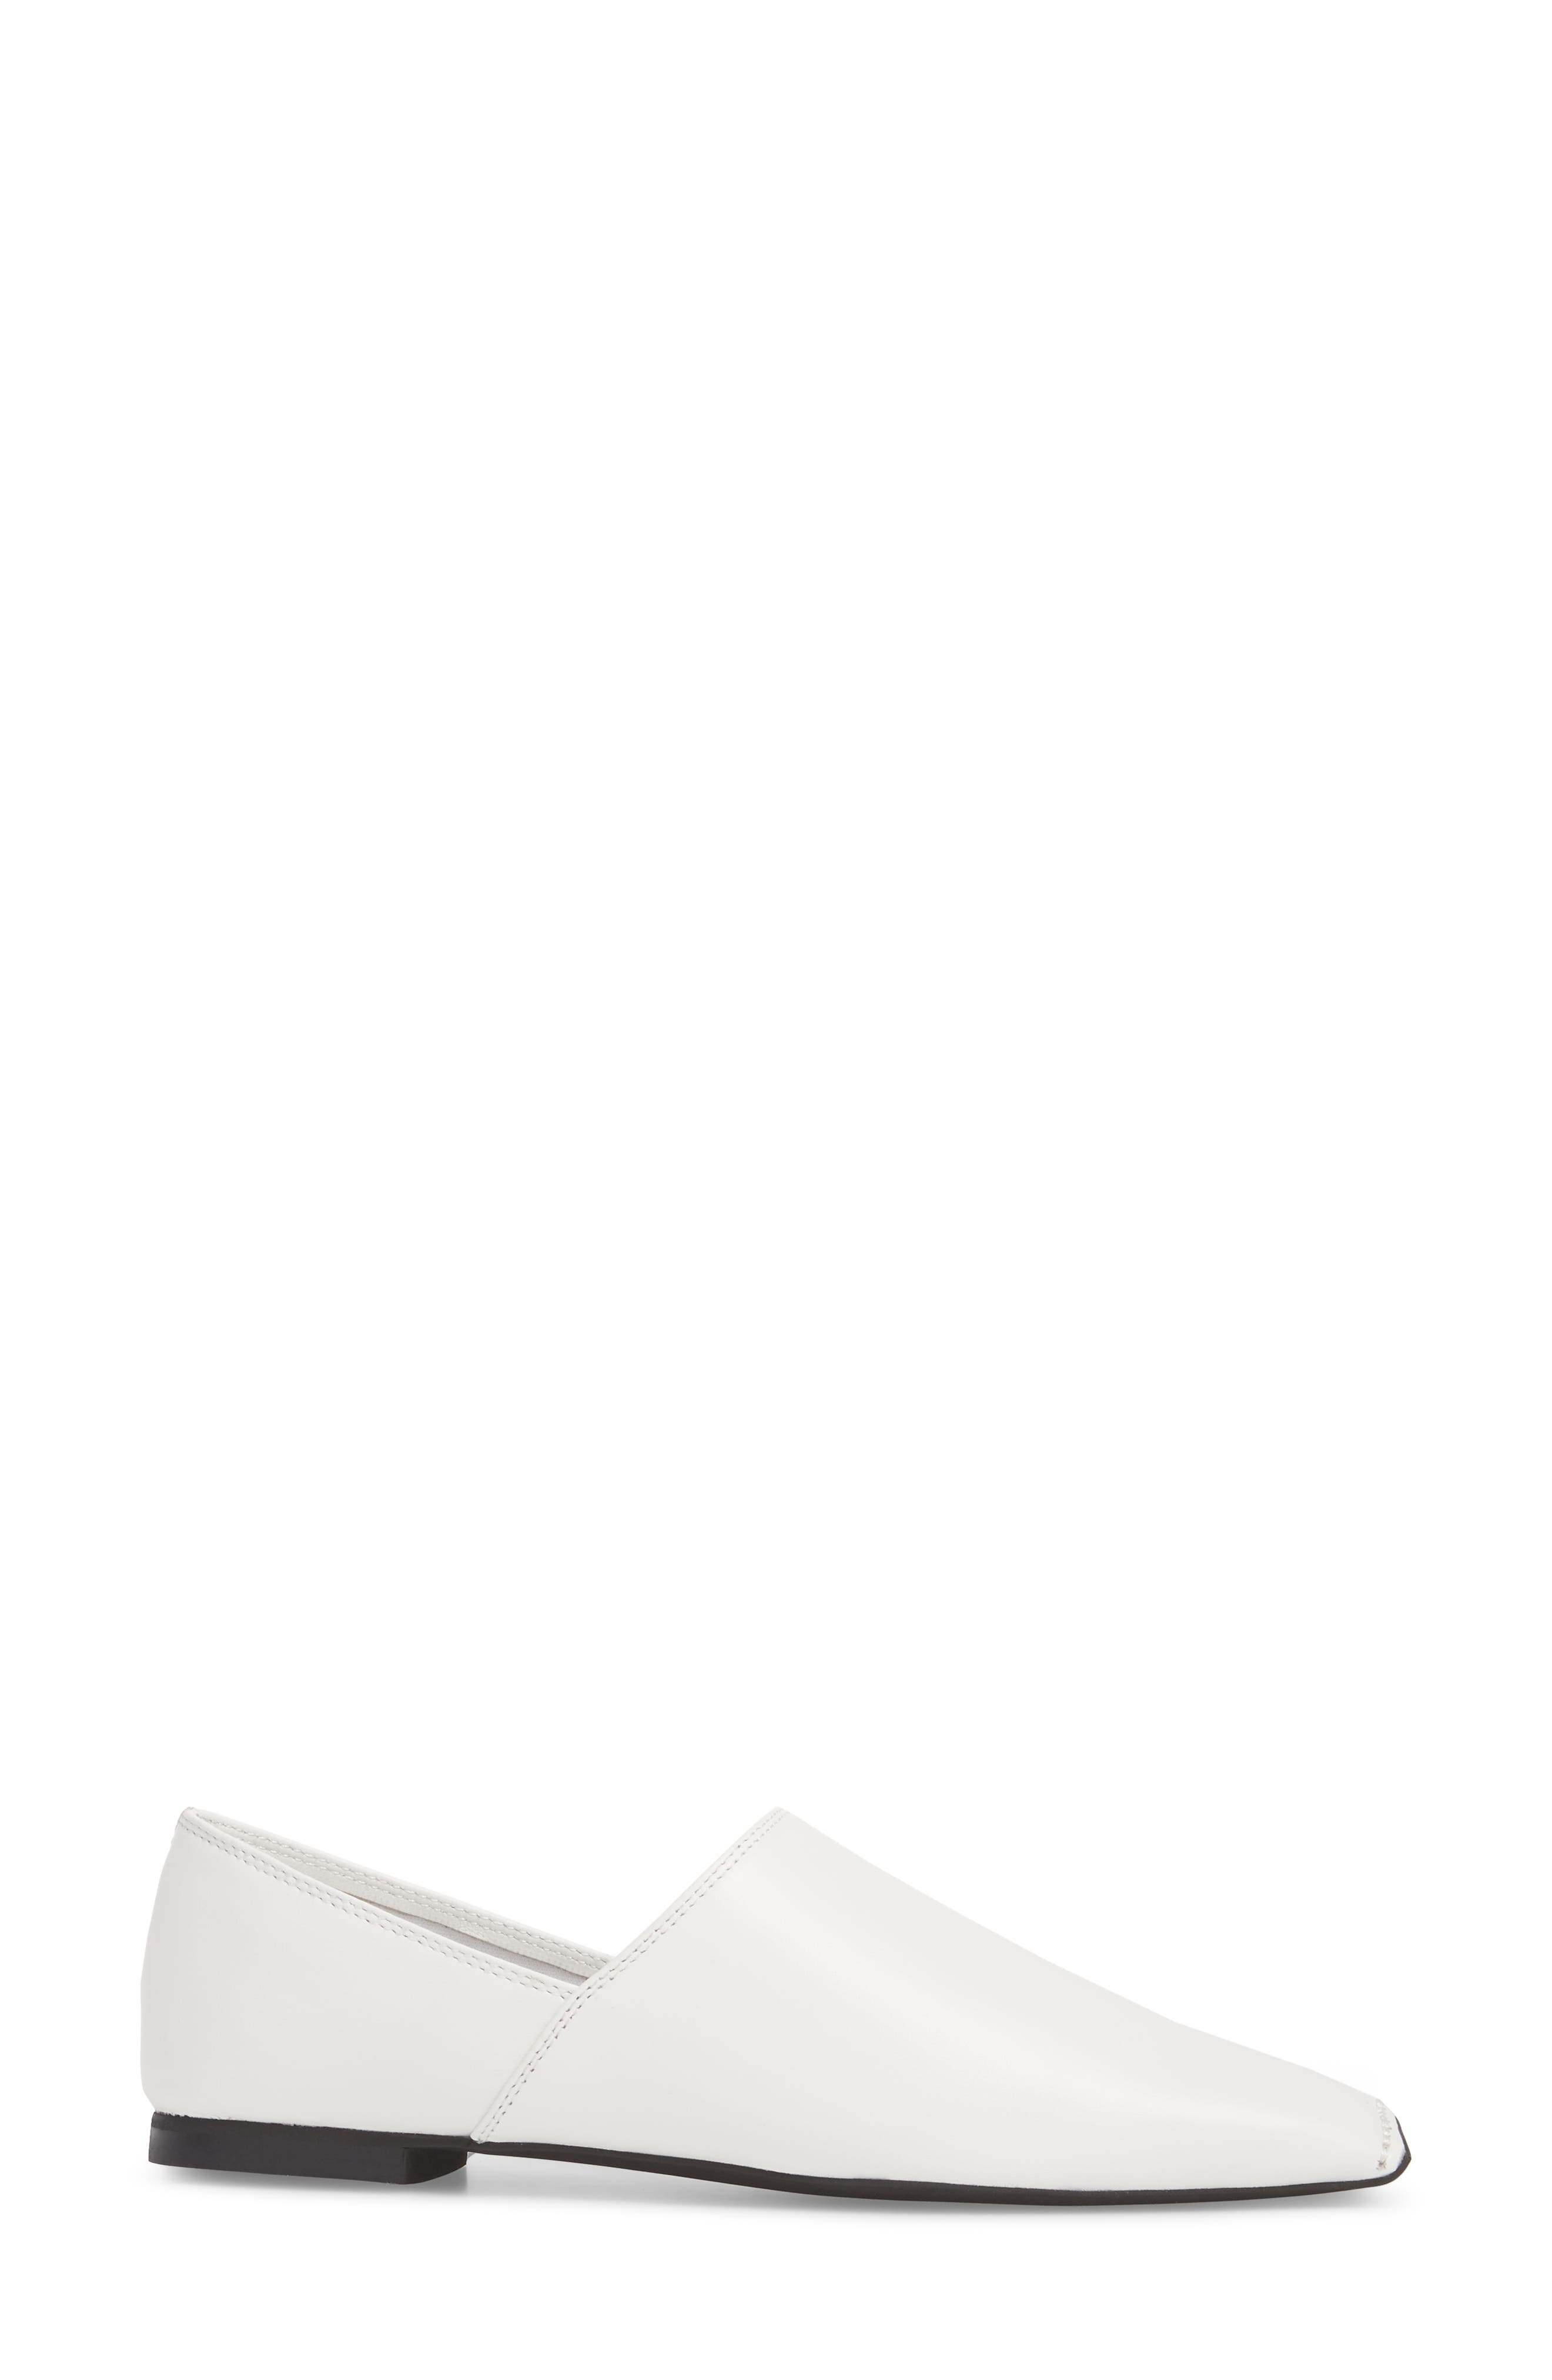 Lanvale Blunted Toe Flat,                             Alternate thumbnail 3, color,                             White